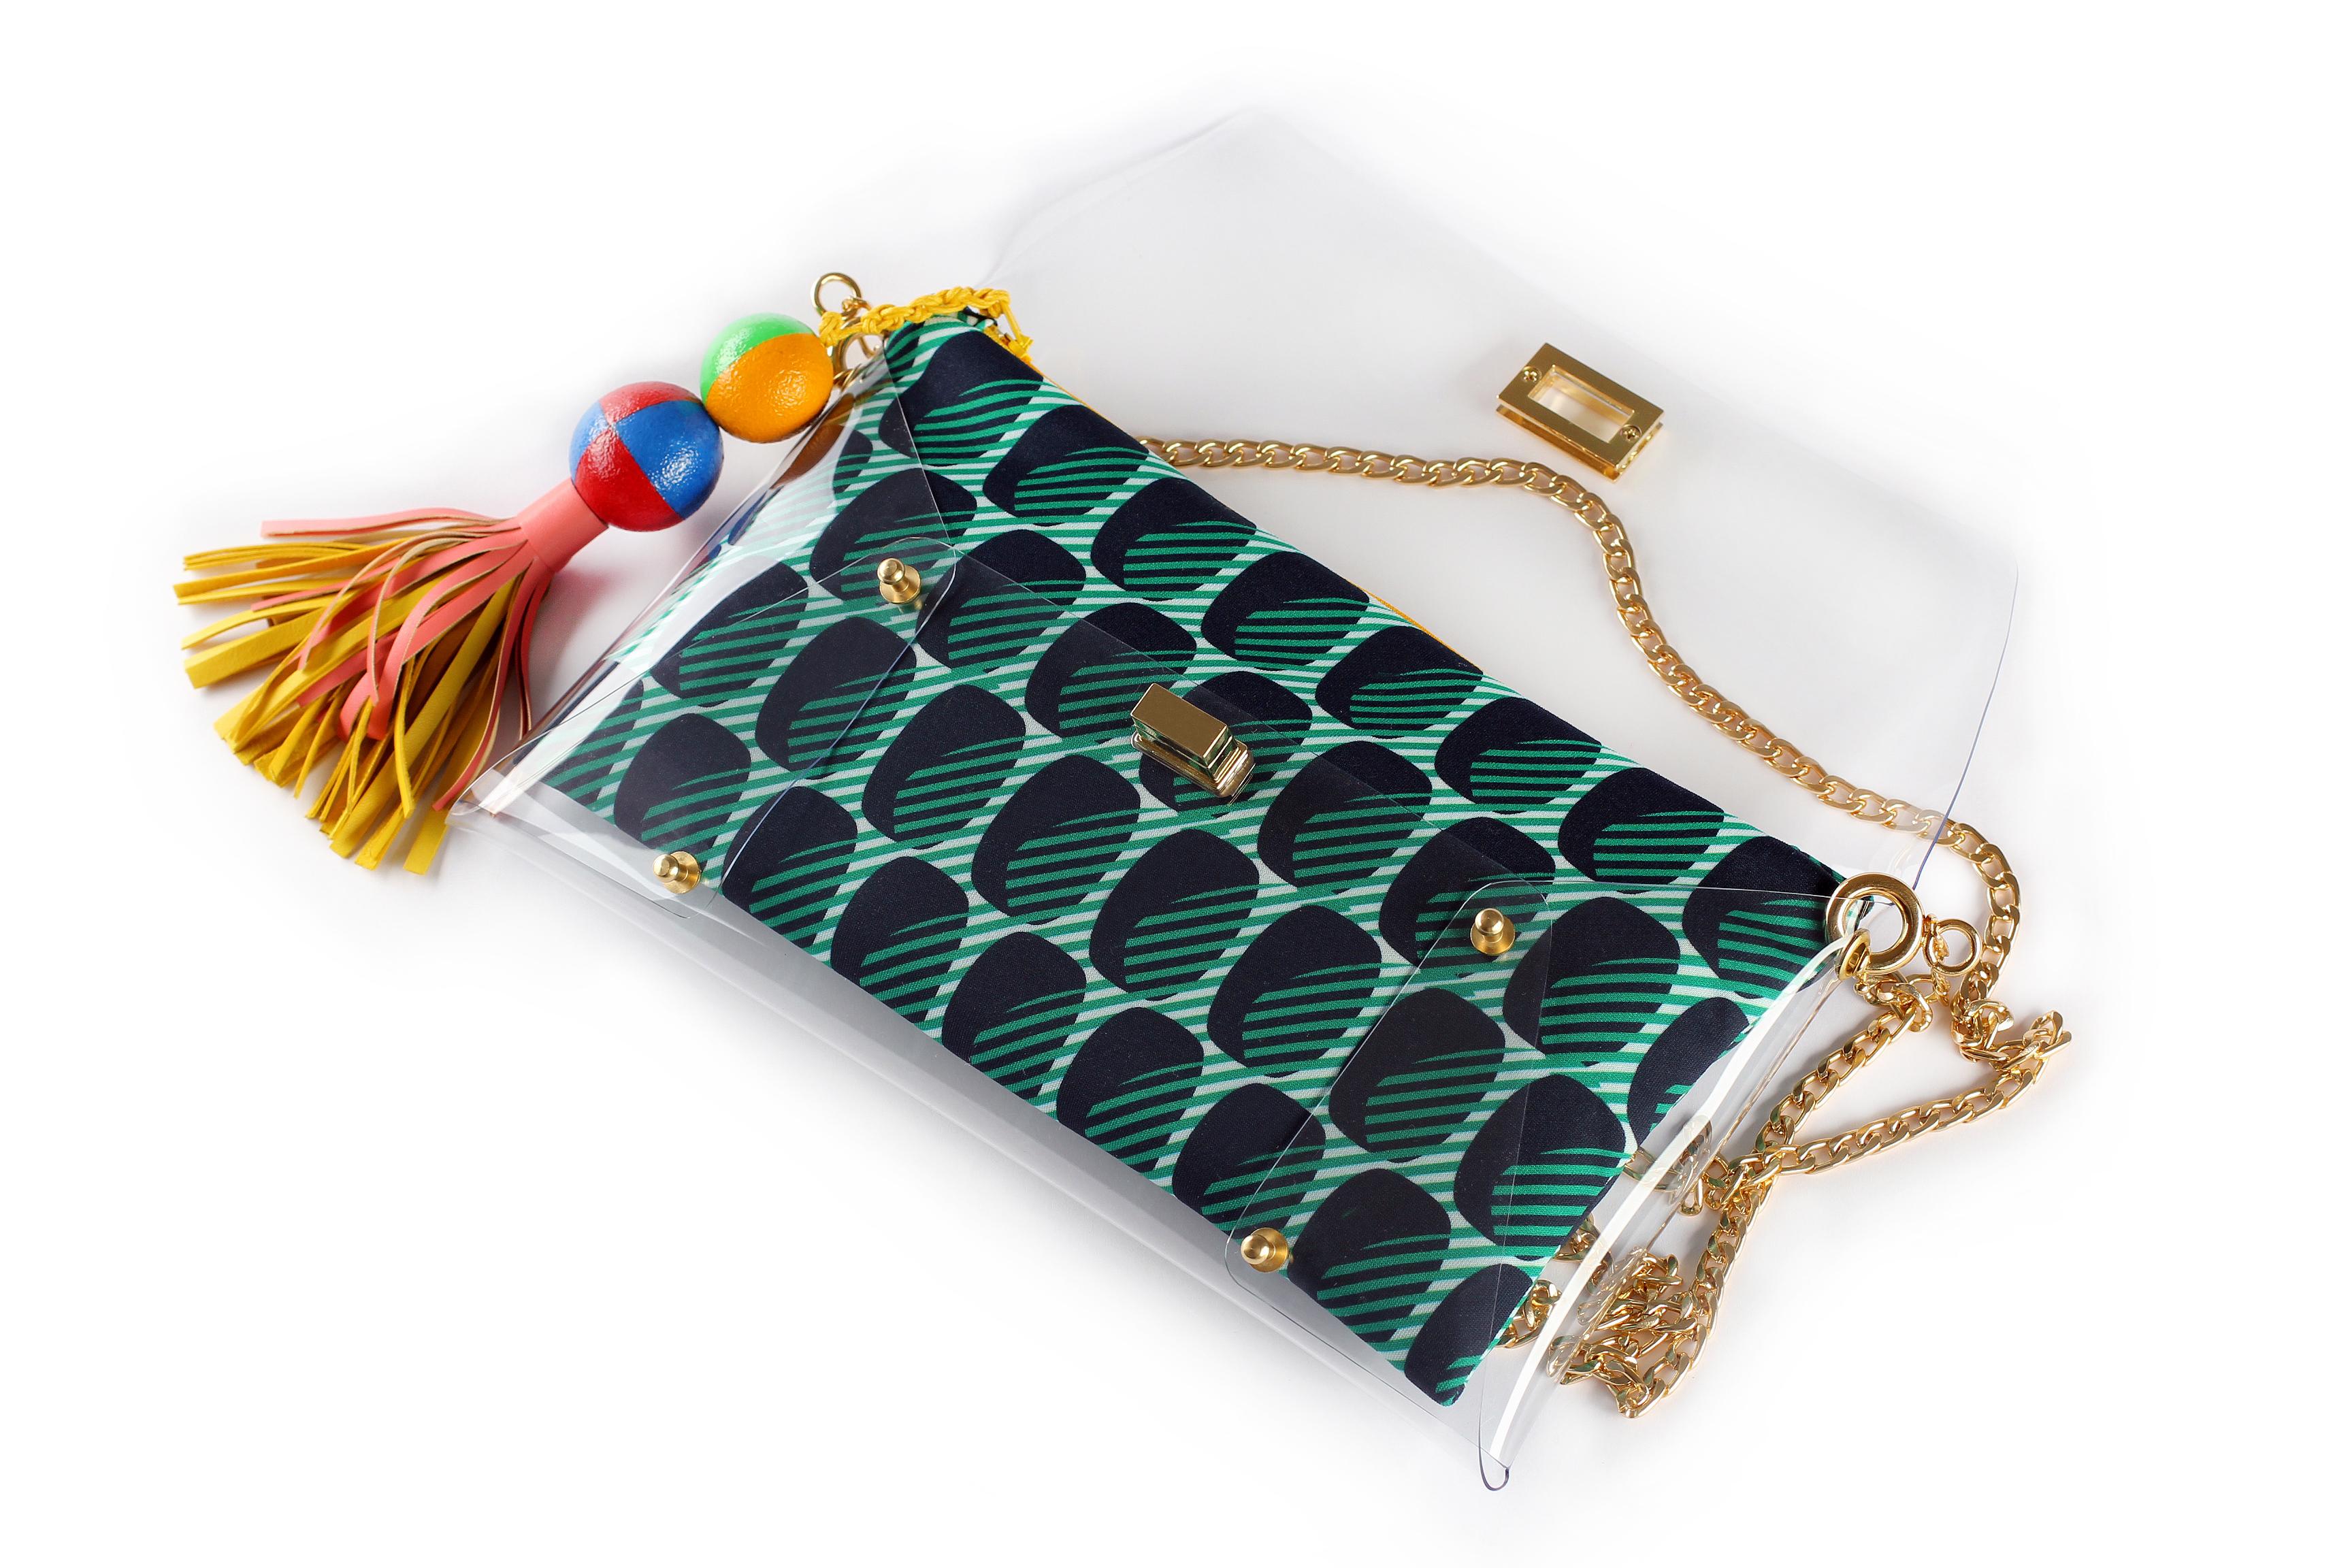 Handbags - Malachite Green Clutchbag - Summer Clutch Bags 2017